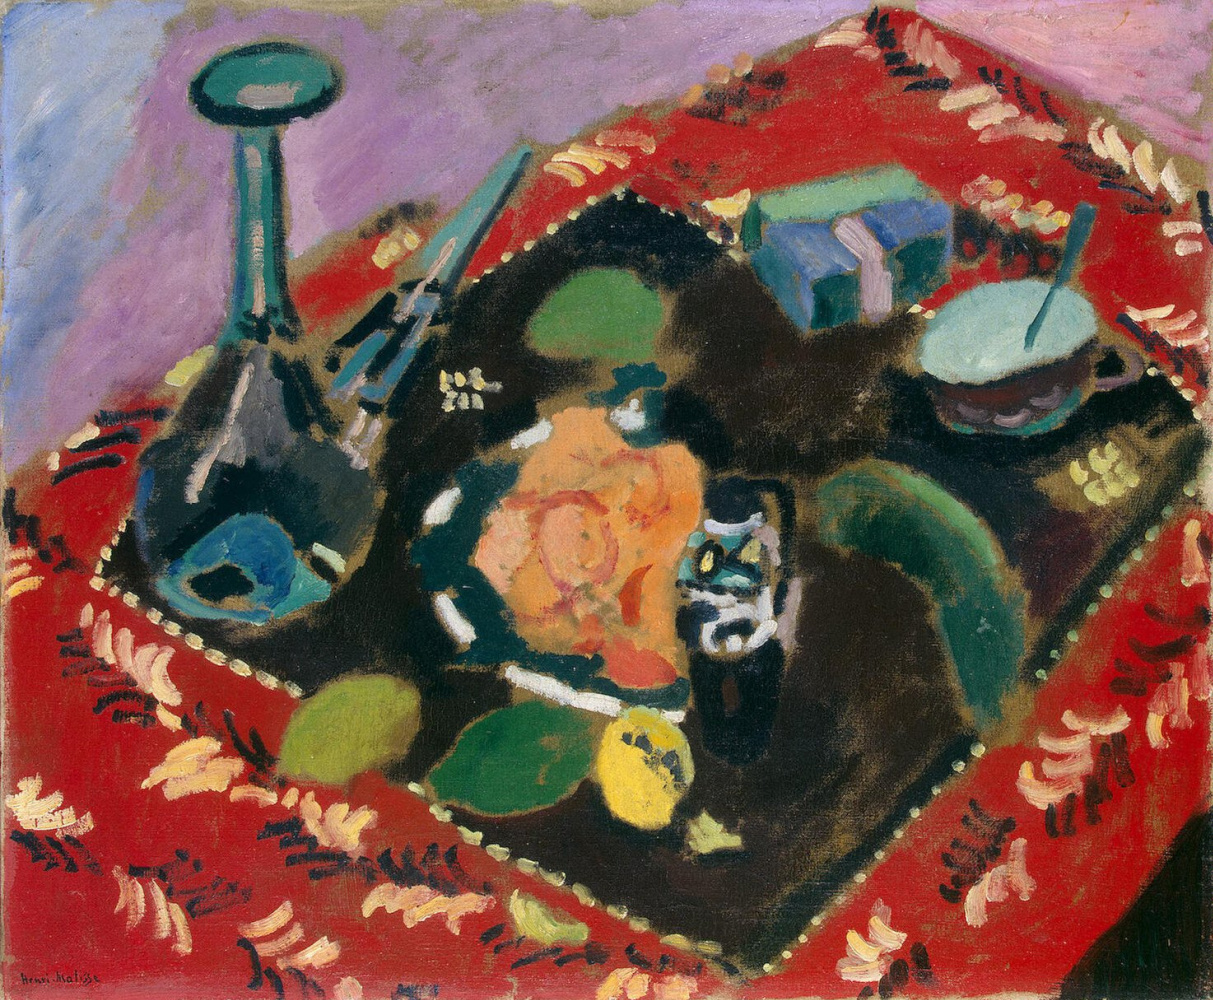 Анри Матисс. Посуда и фрукты на красно-черном ковре